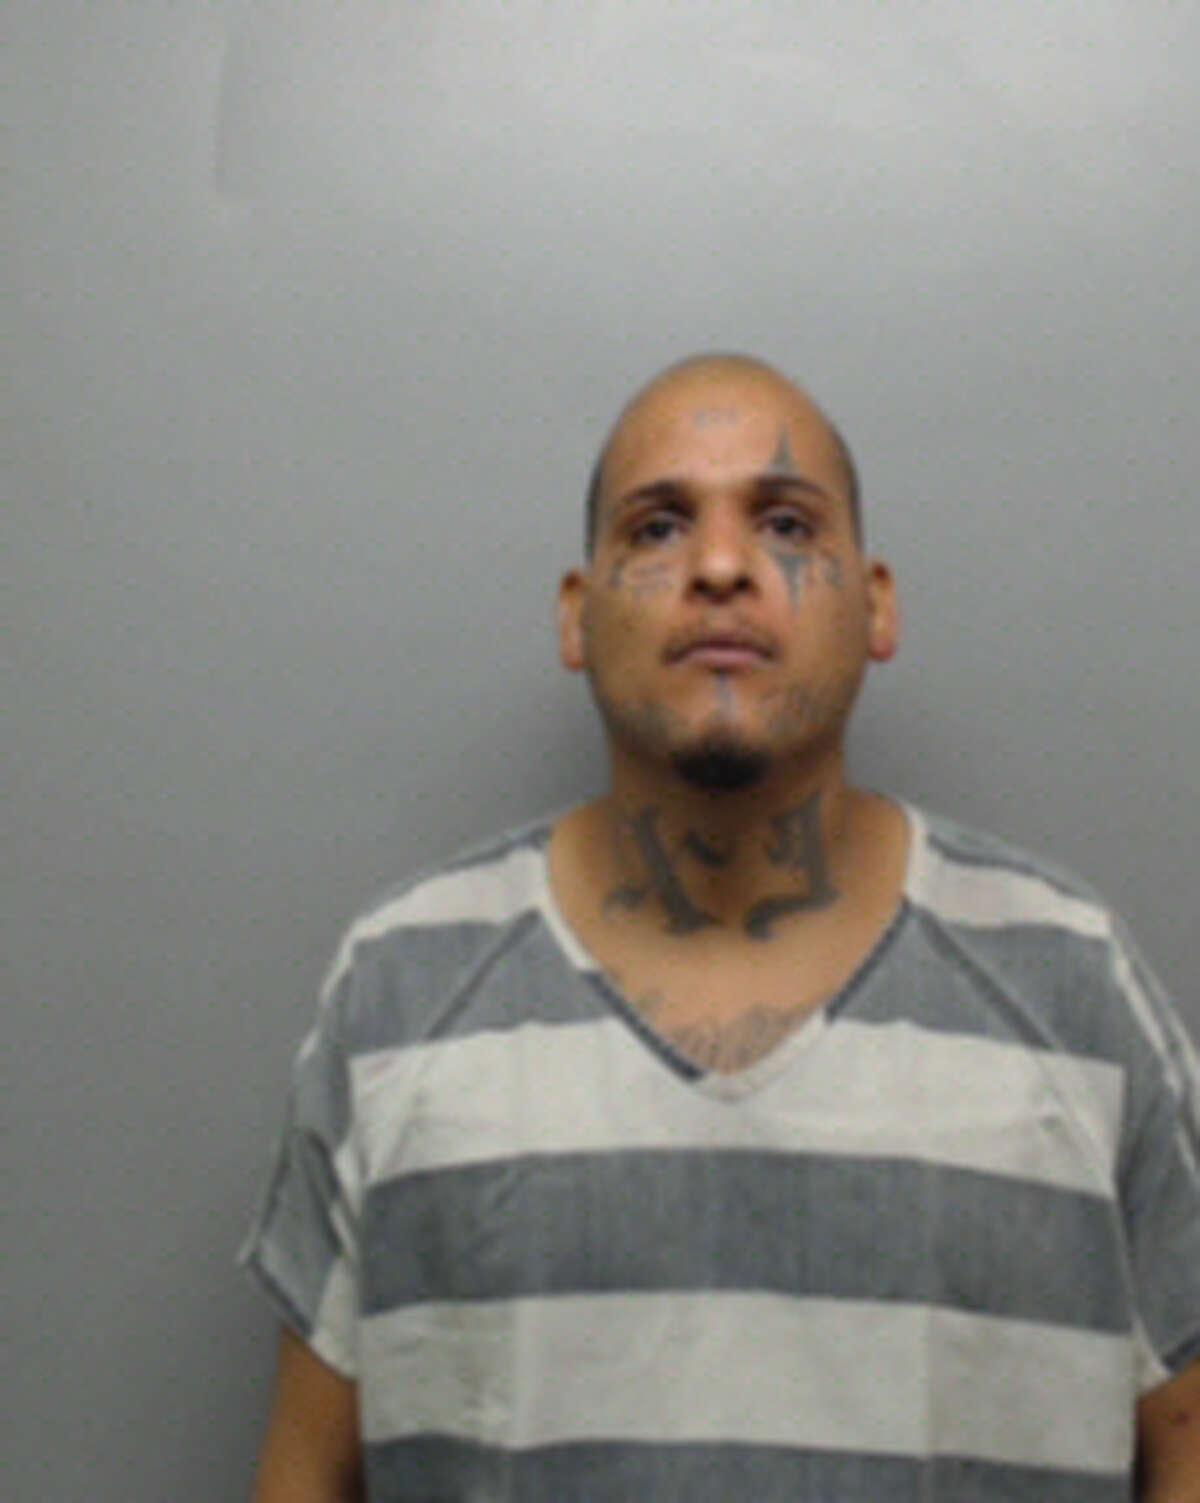 Juan Emilio Ortiz, 30, failure to register as a sex offender